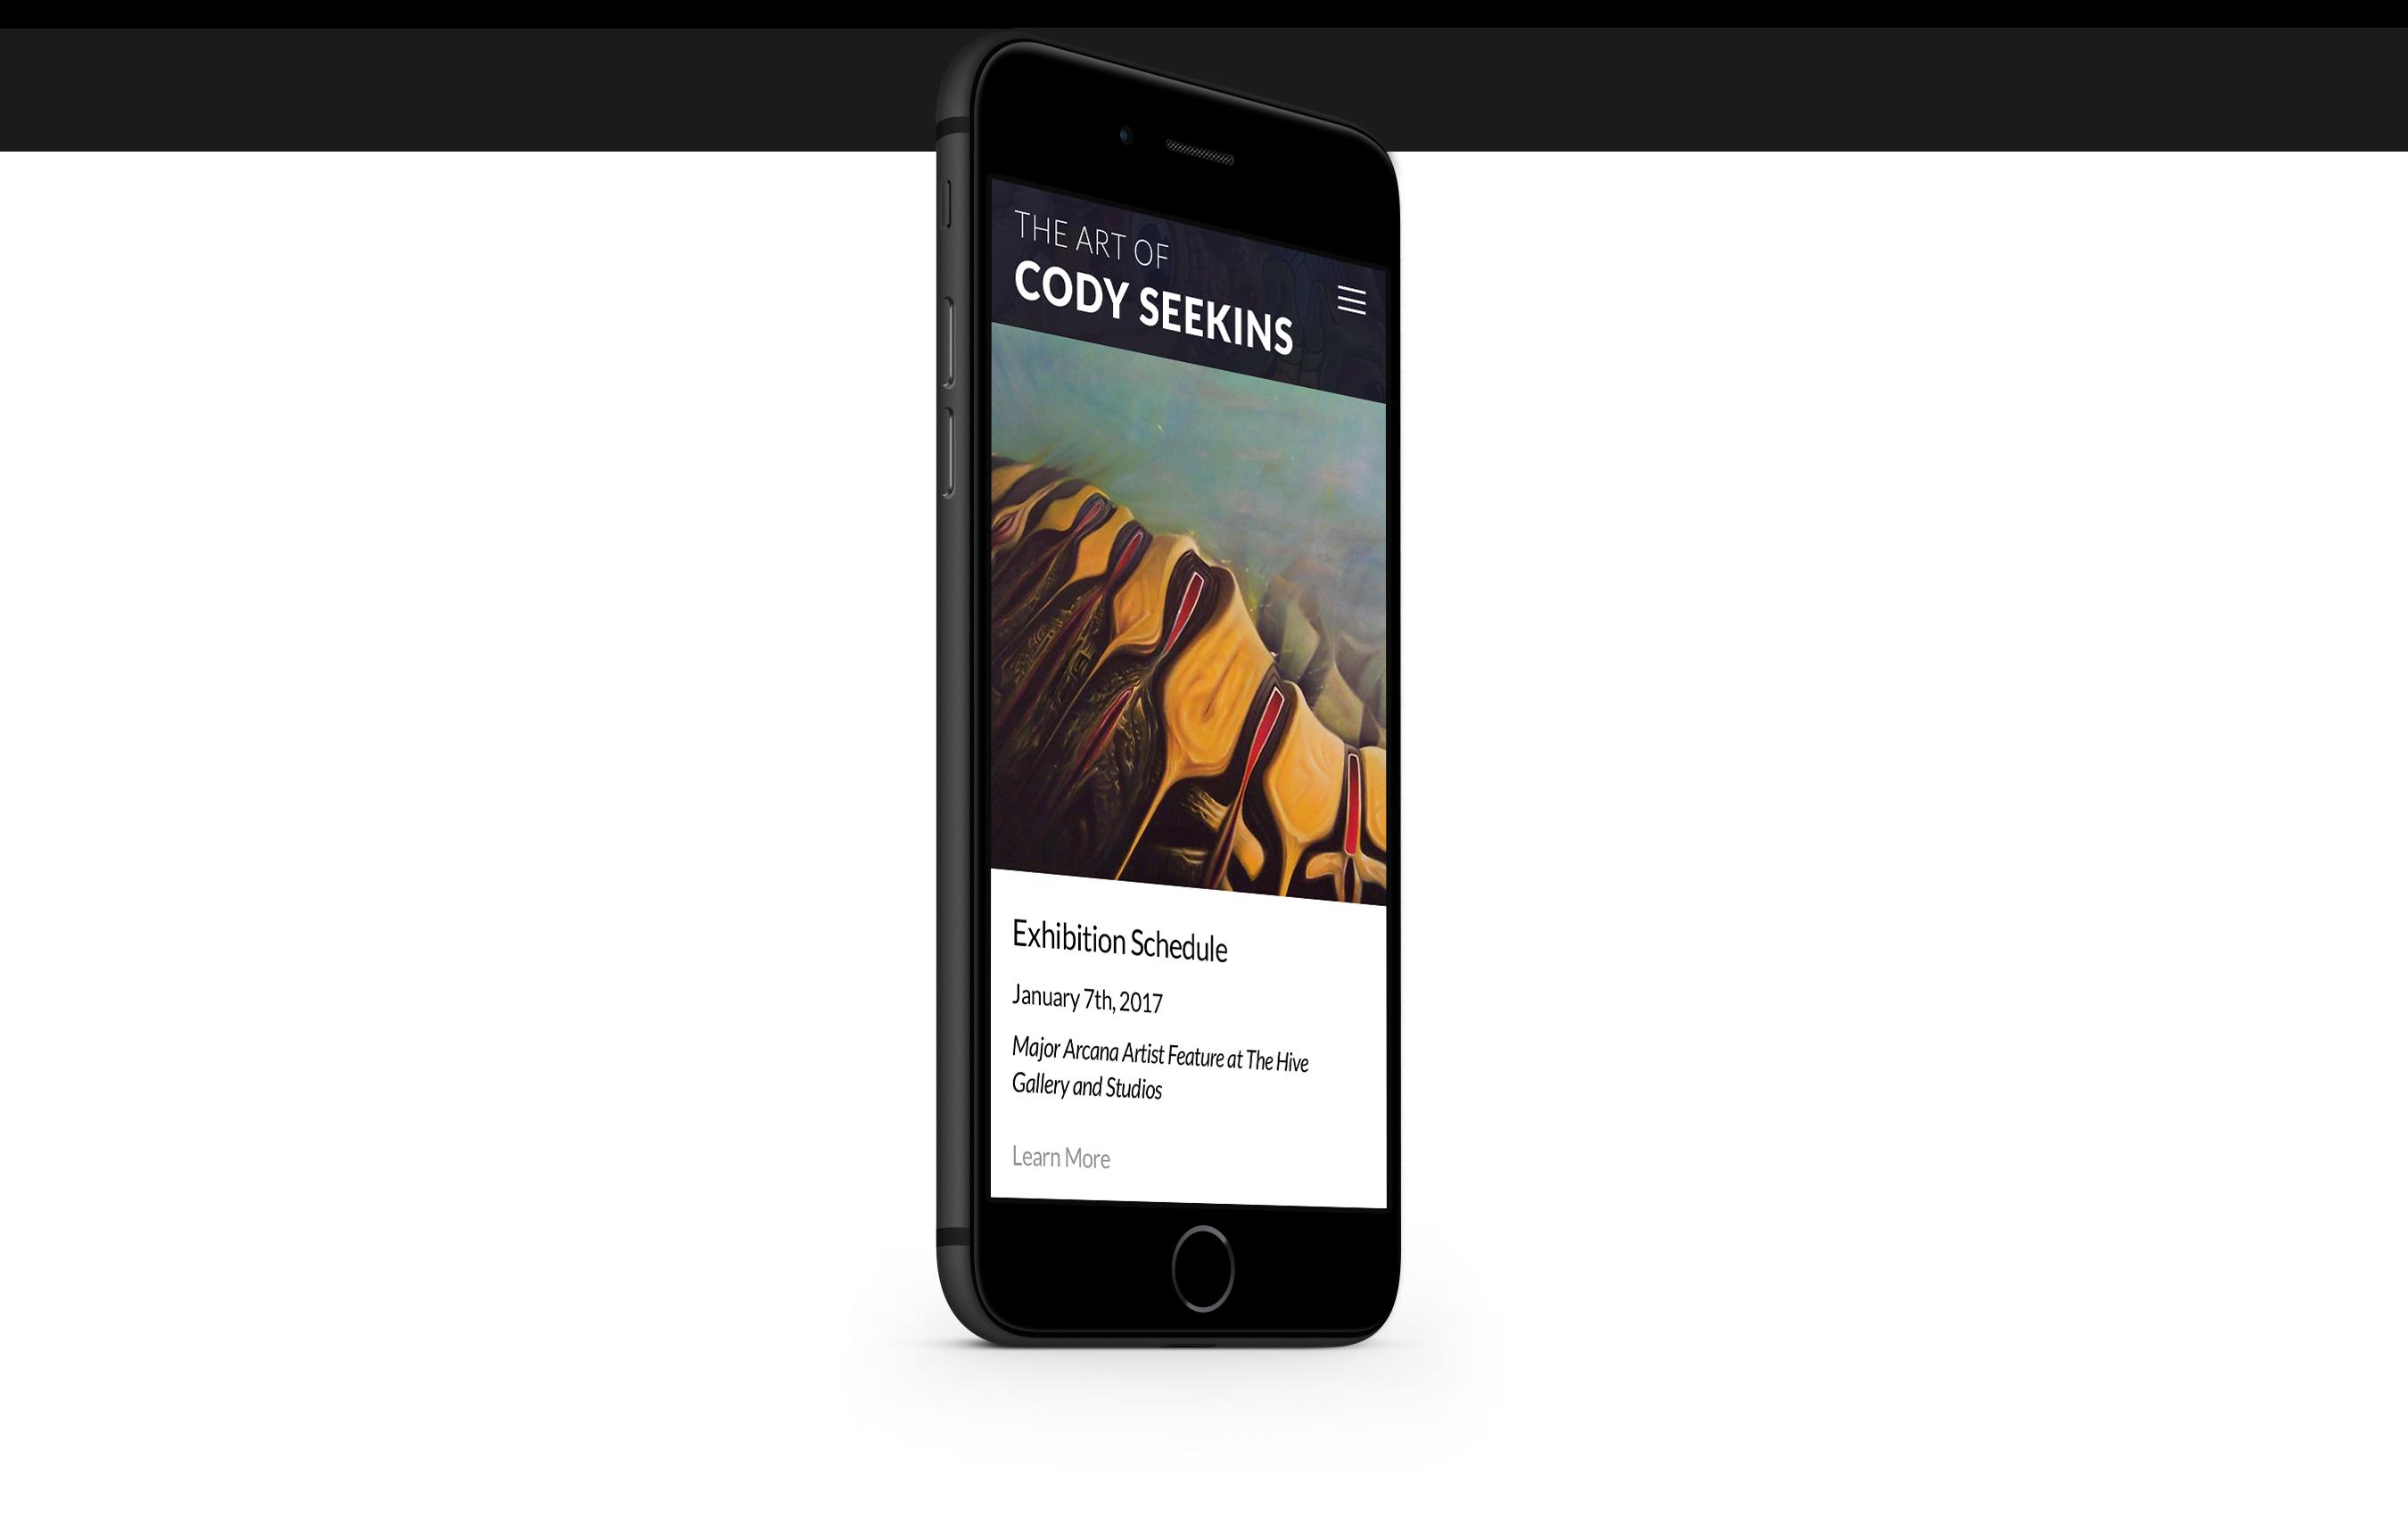 codyseekins.com mobile site design